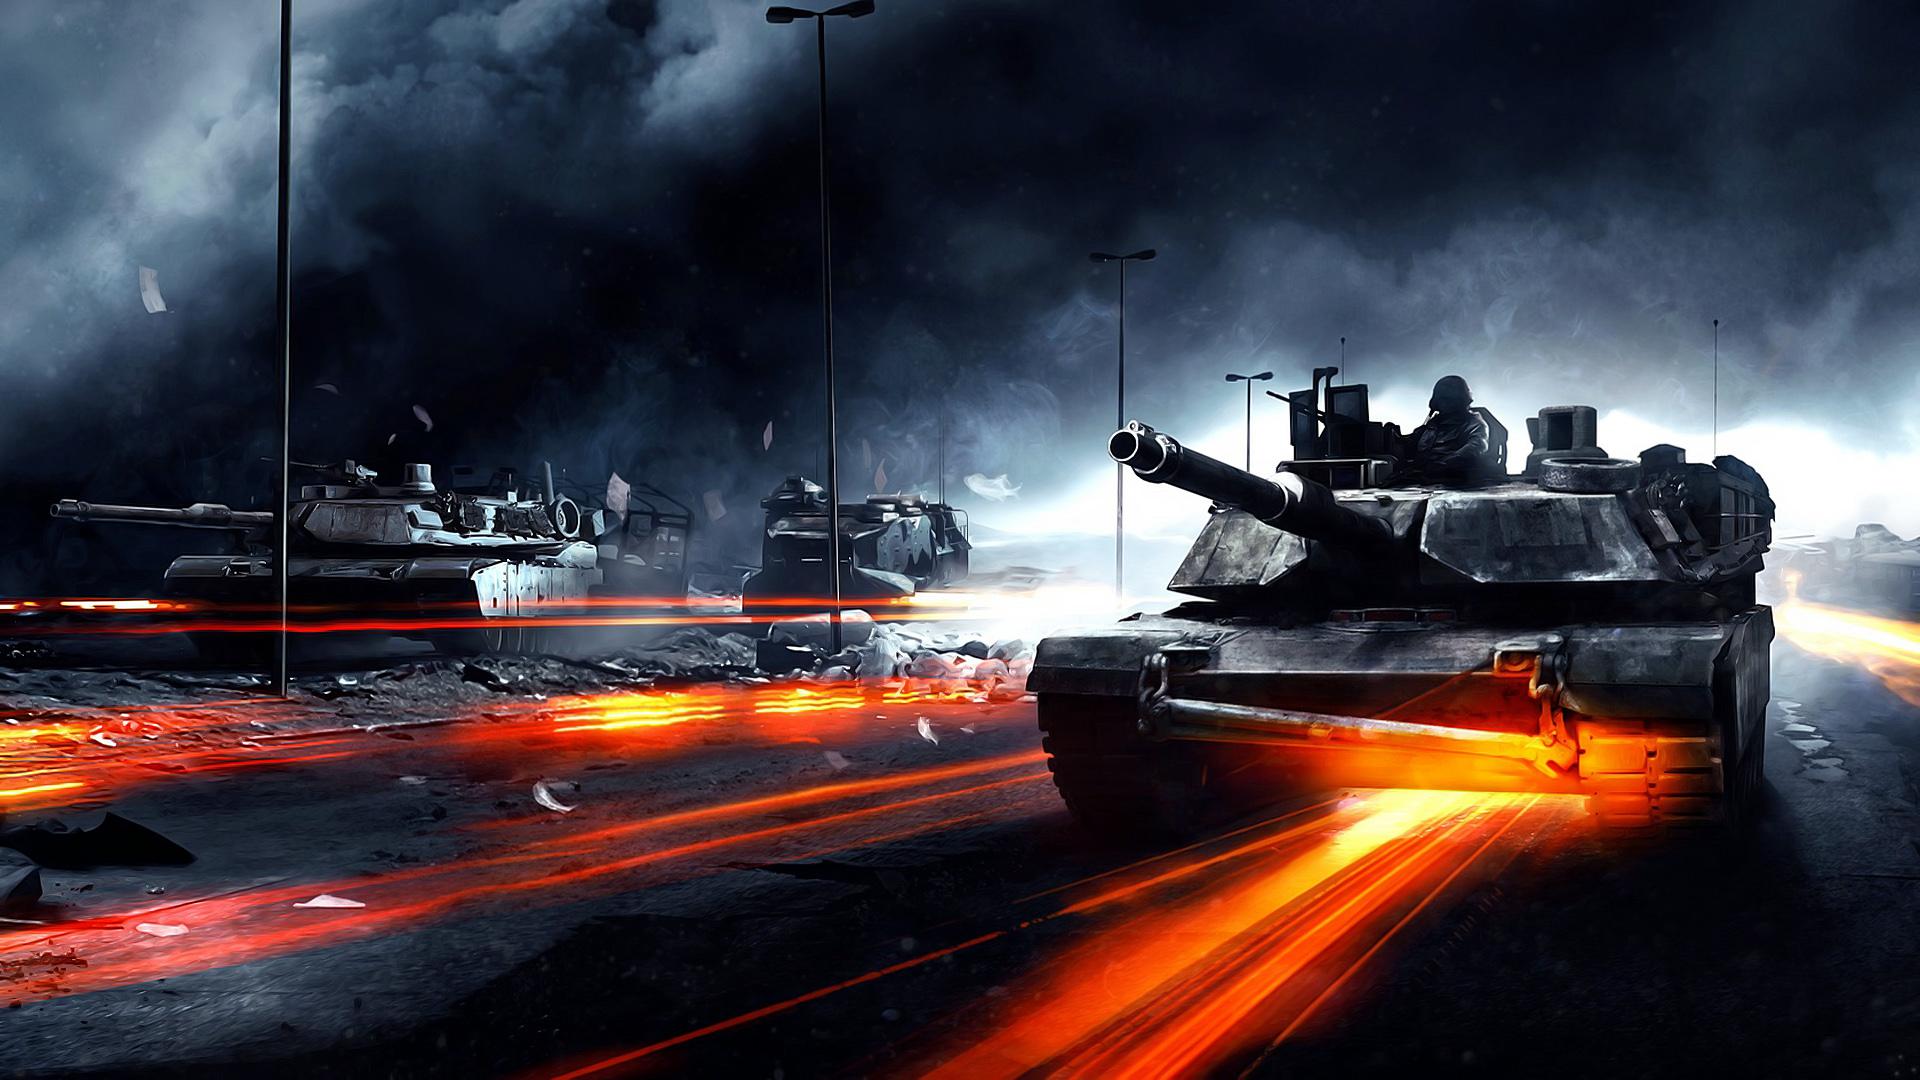 Battlefield 3 Tanks Wallpapers HD Wallpapers 1920x1080